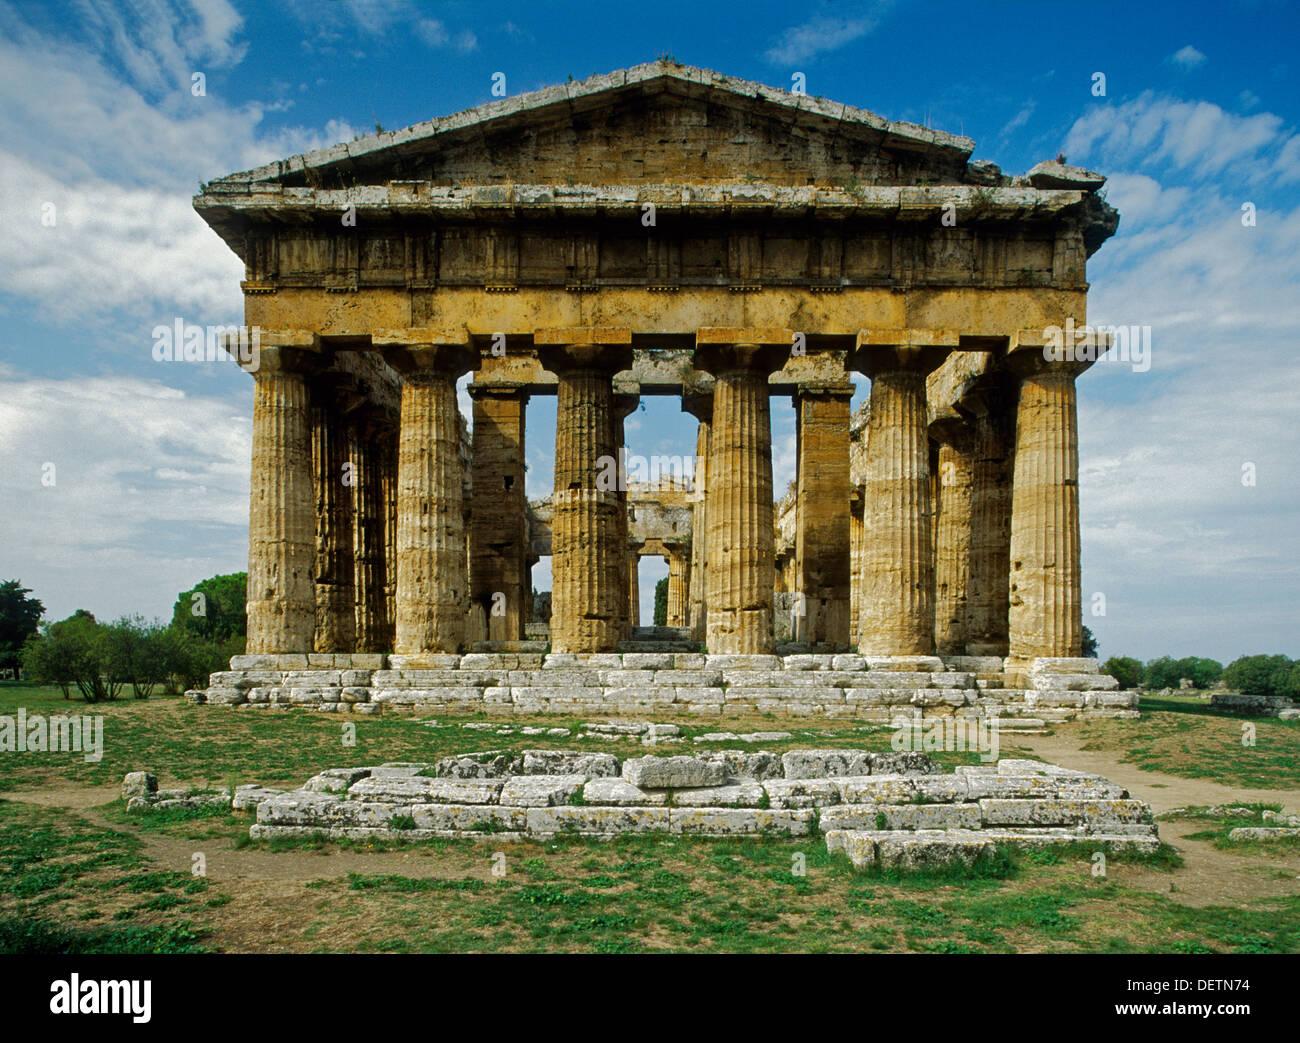 Temple of Neptune (5th century BC) at Paestum, Campania, Italy - Stock Image